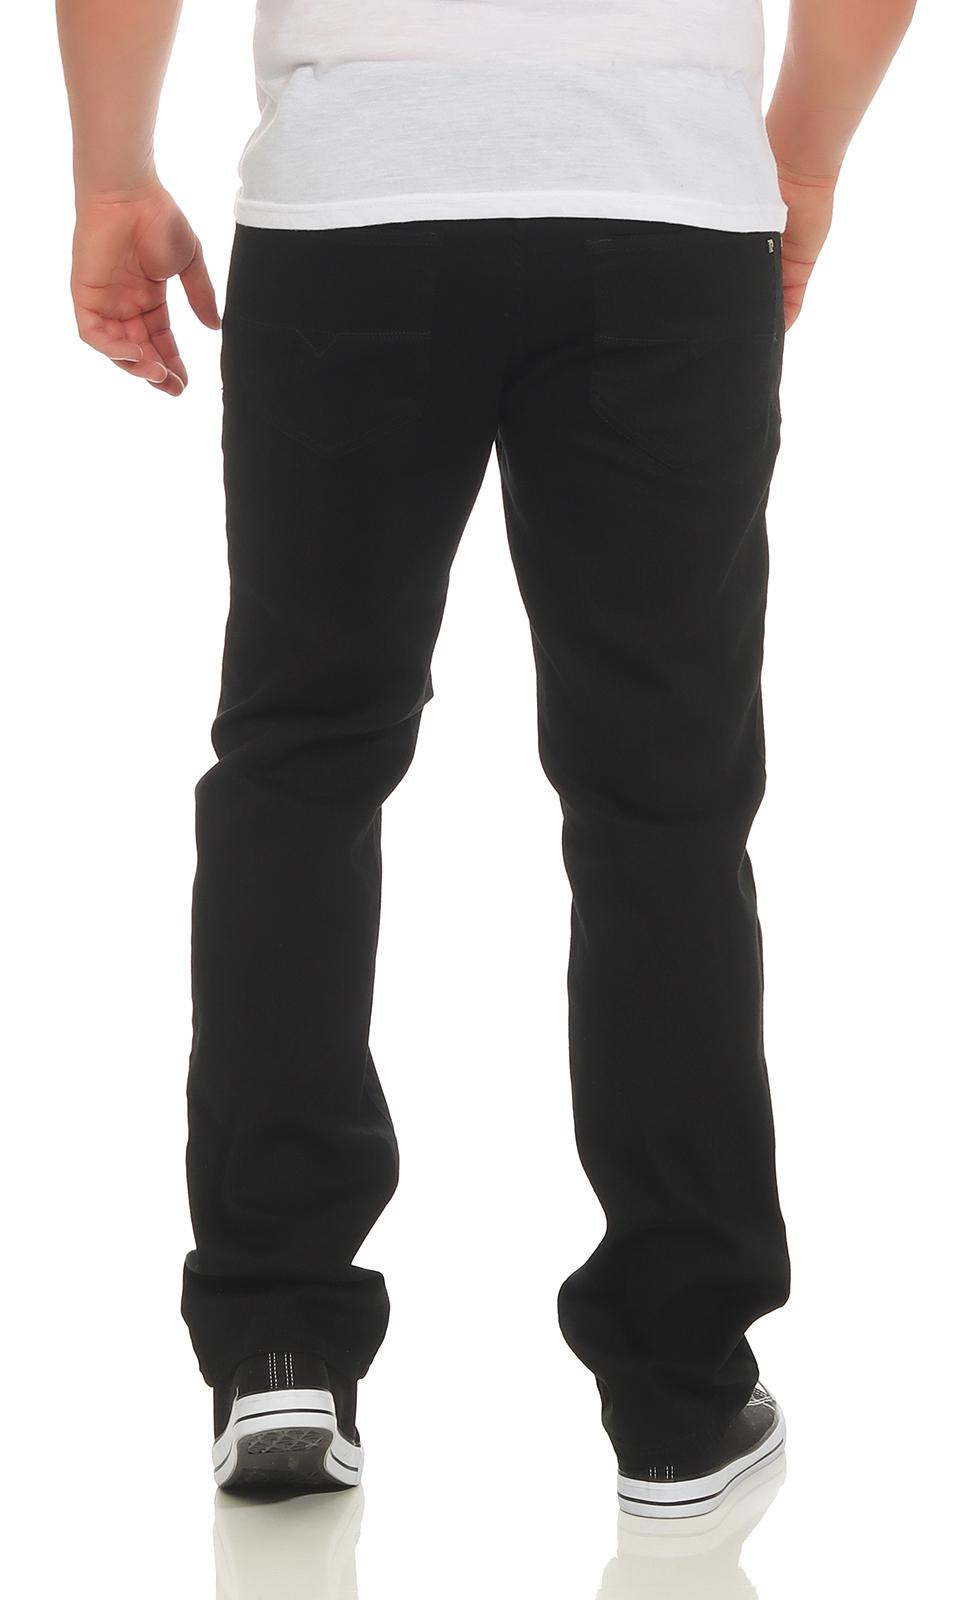 PIERRE-CARDIN-Herren-Jeans-Dijon-Hose-Comfort-Stretch-Freizeitjeans-Modern-NEU-3 Indexbild 12